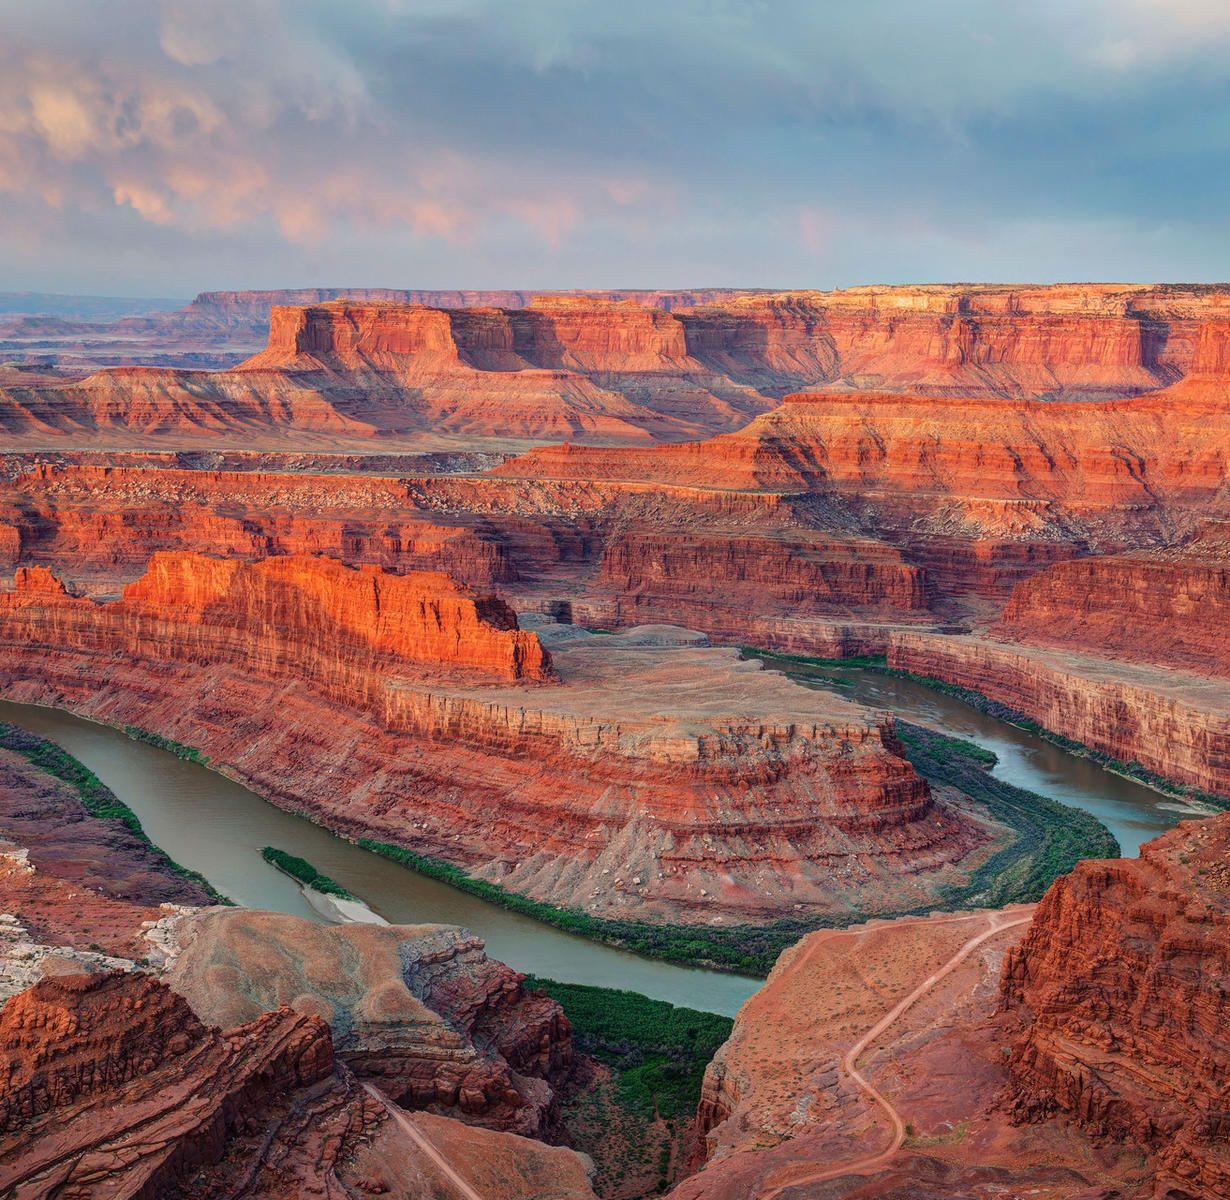 Canyonlands National Park Canyonlands National Park, Utah